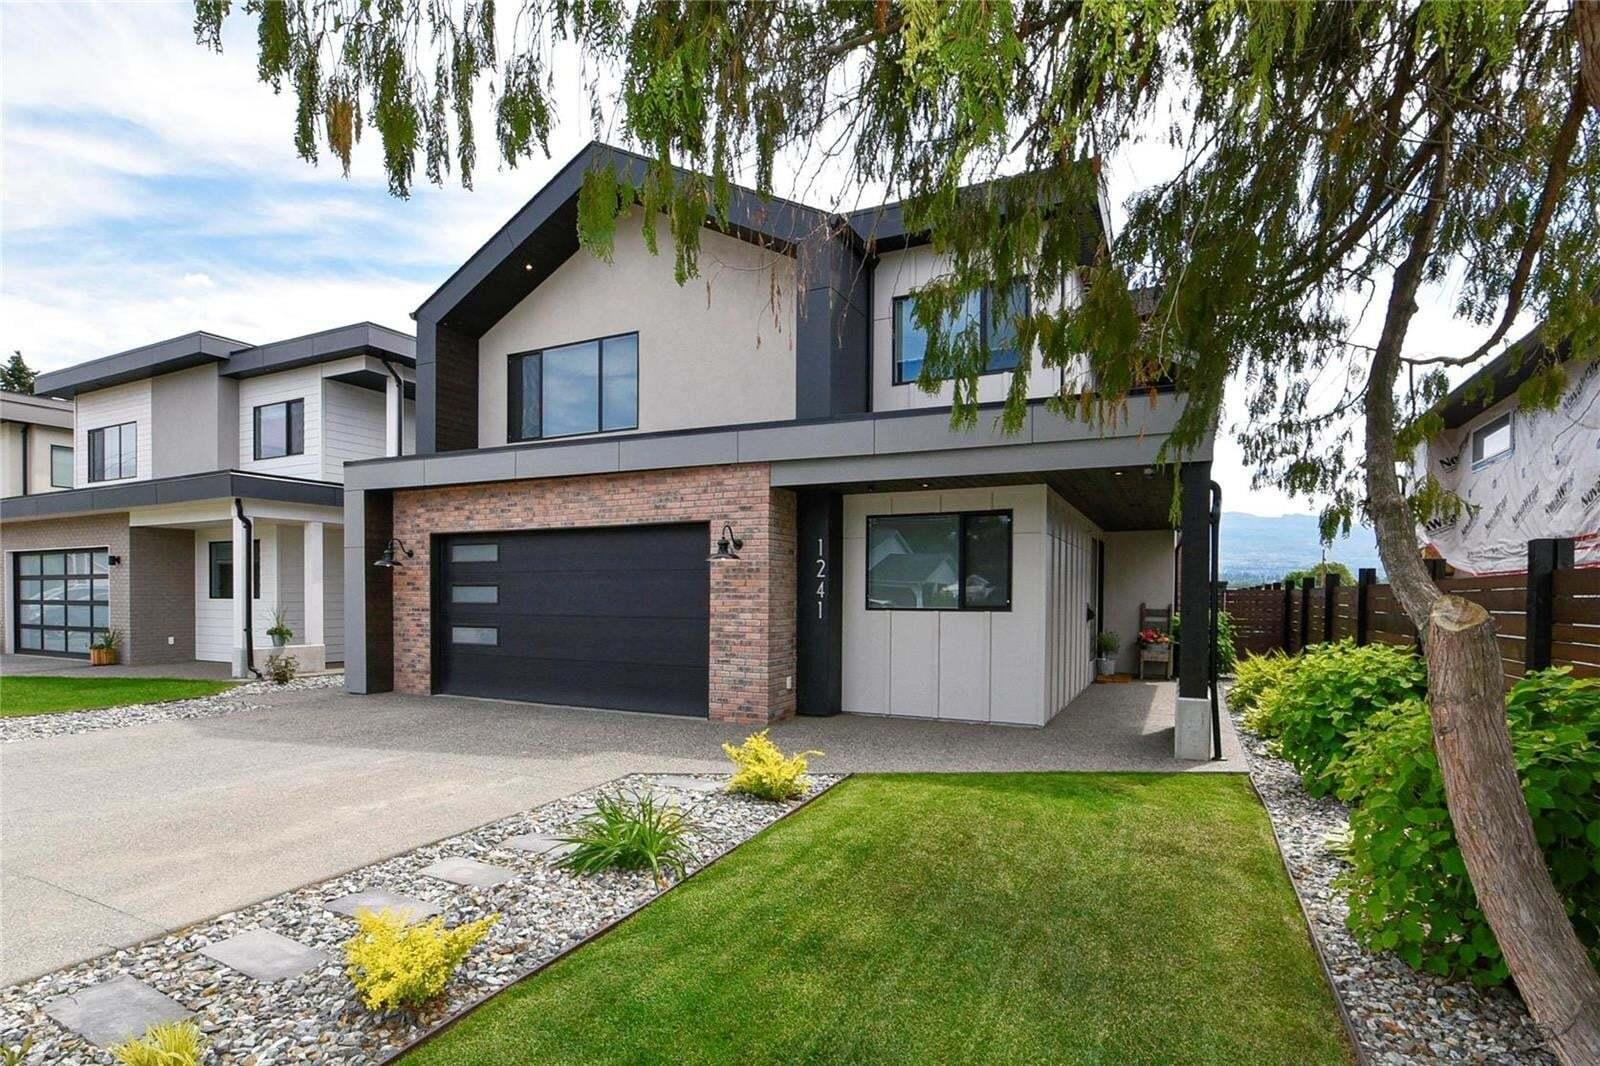 House for sale at 1241 Ladner Rd Kelowna British Columbia - MLS: 10200869